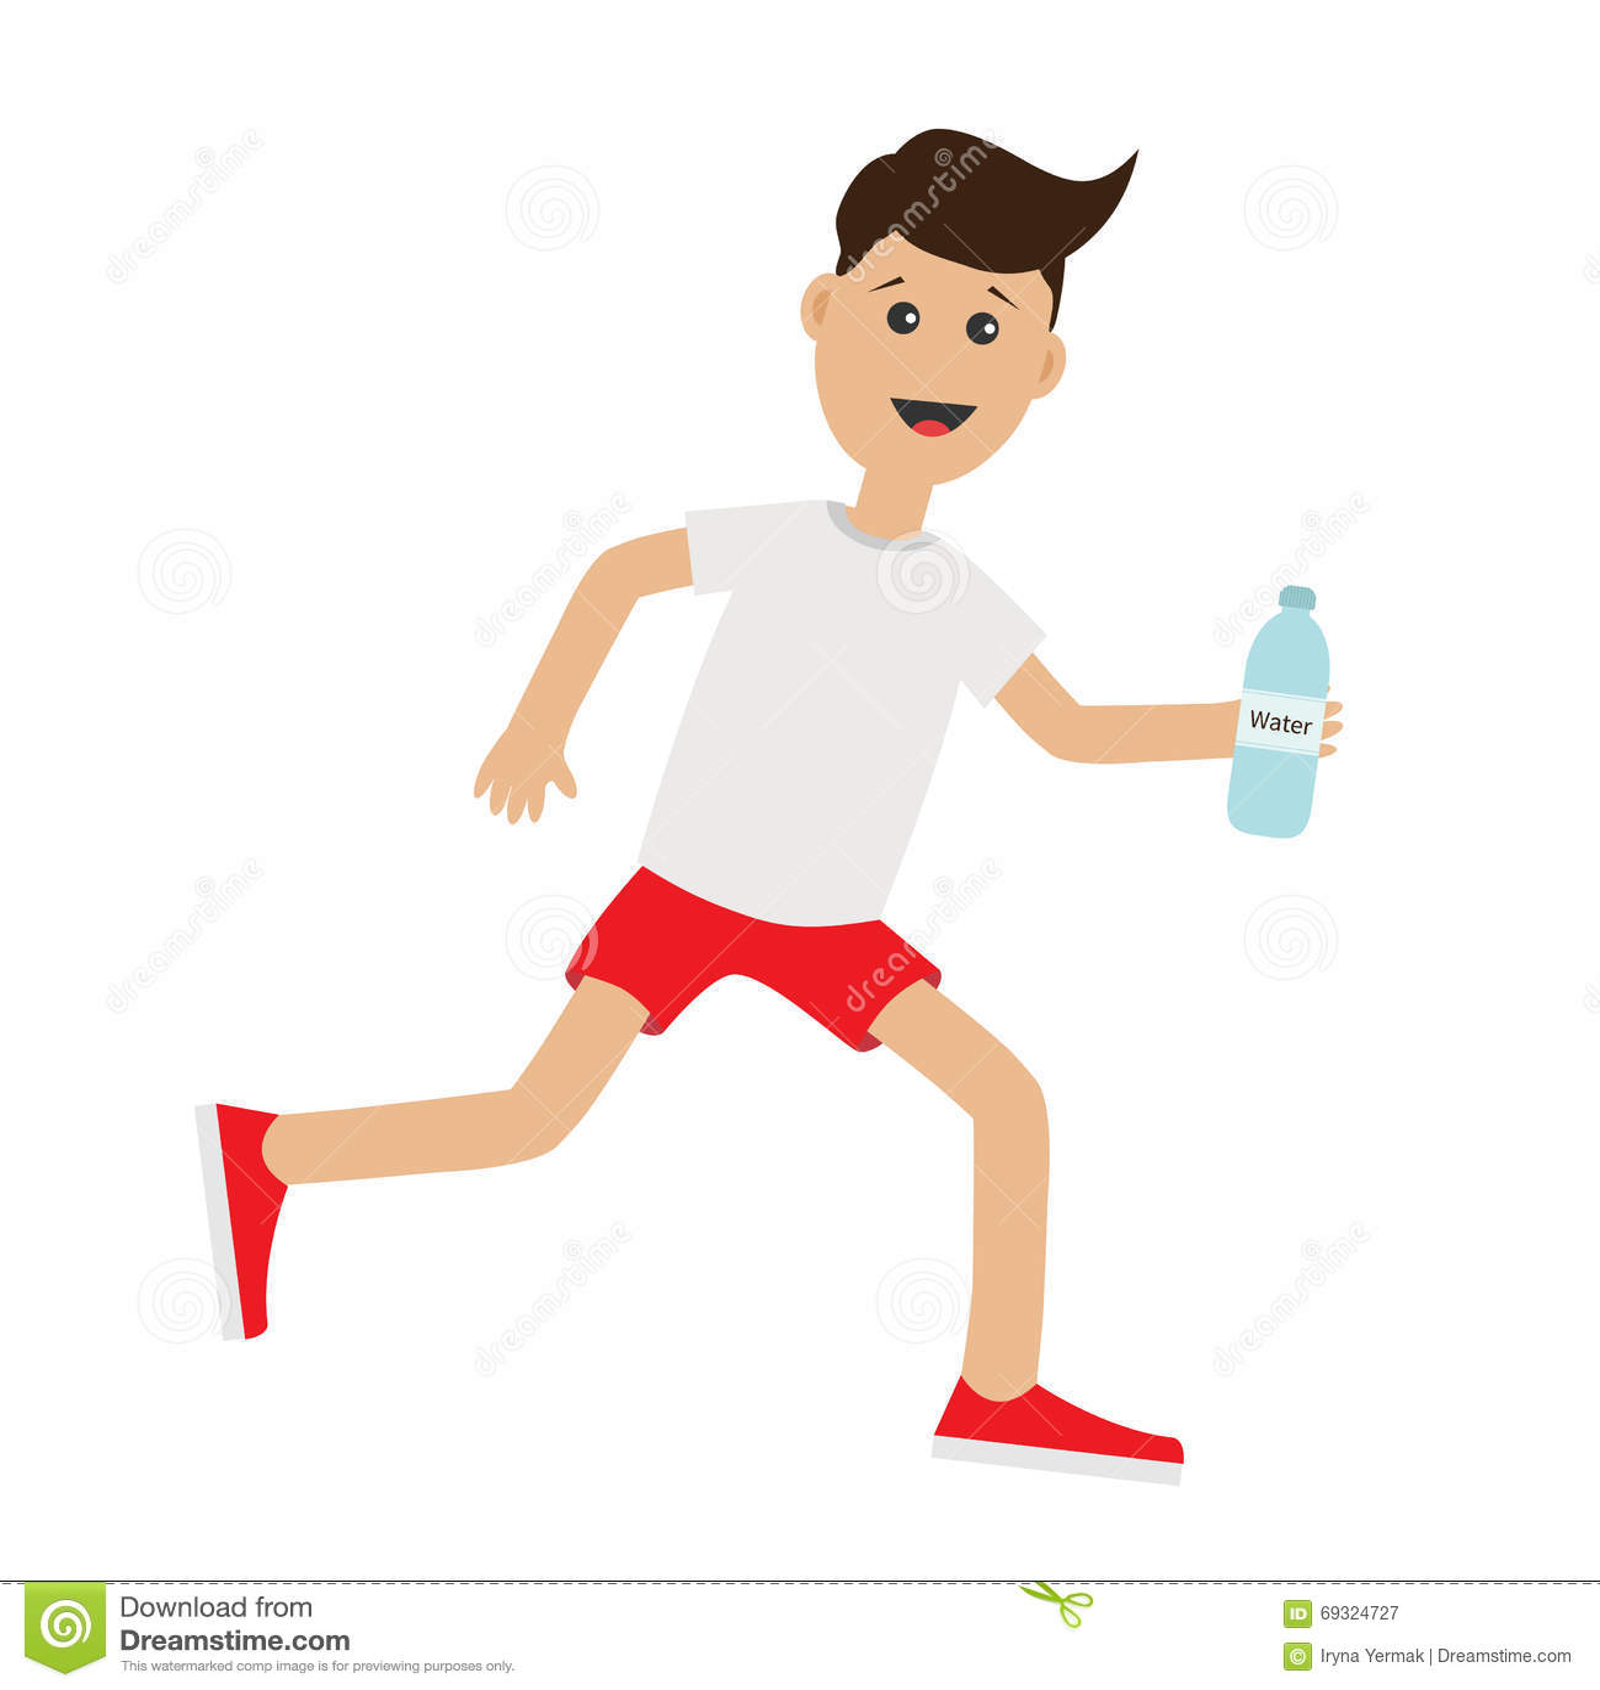 Funny Cartoon Running Guy Holding Water Bottle. Cute Run ...